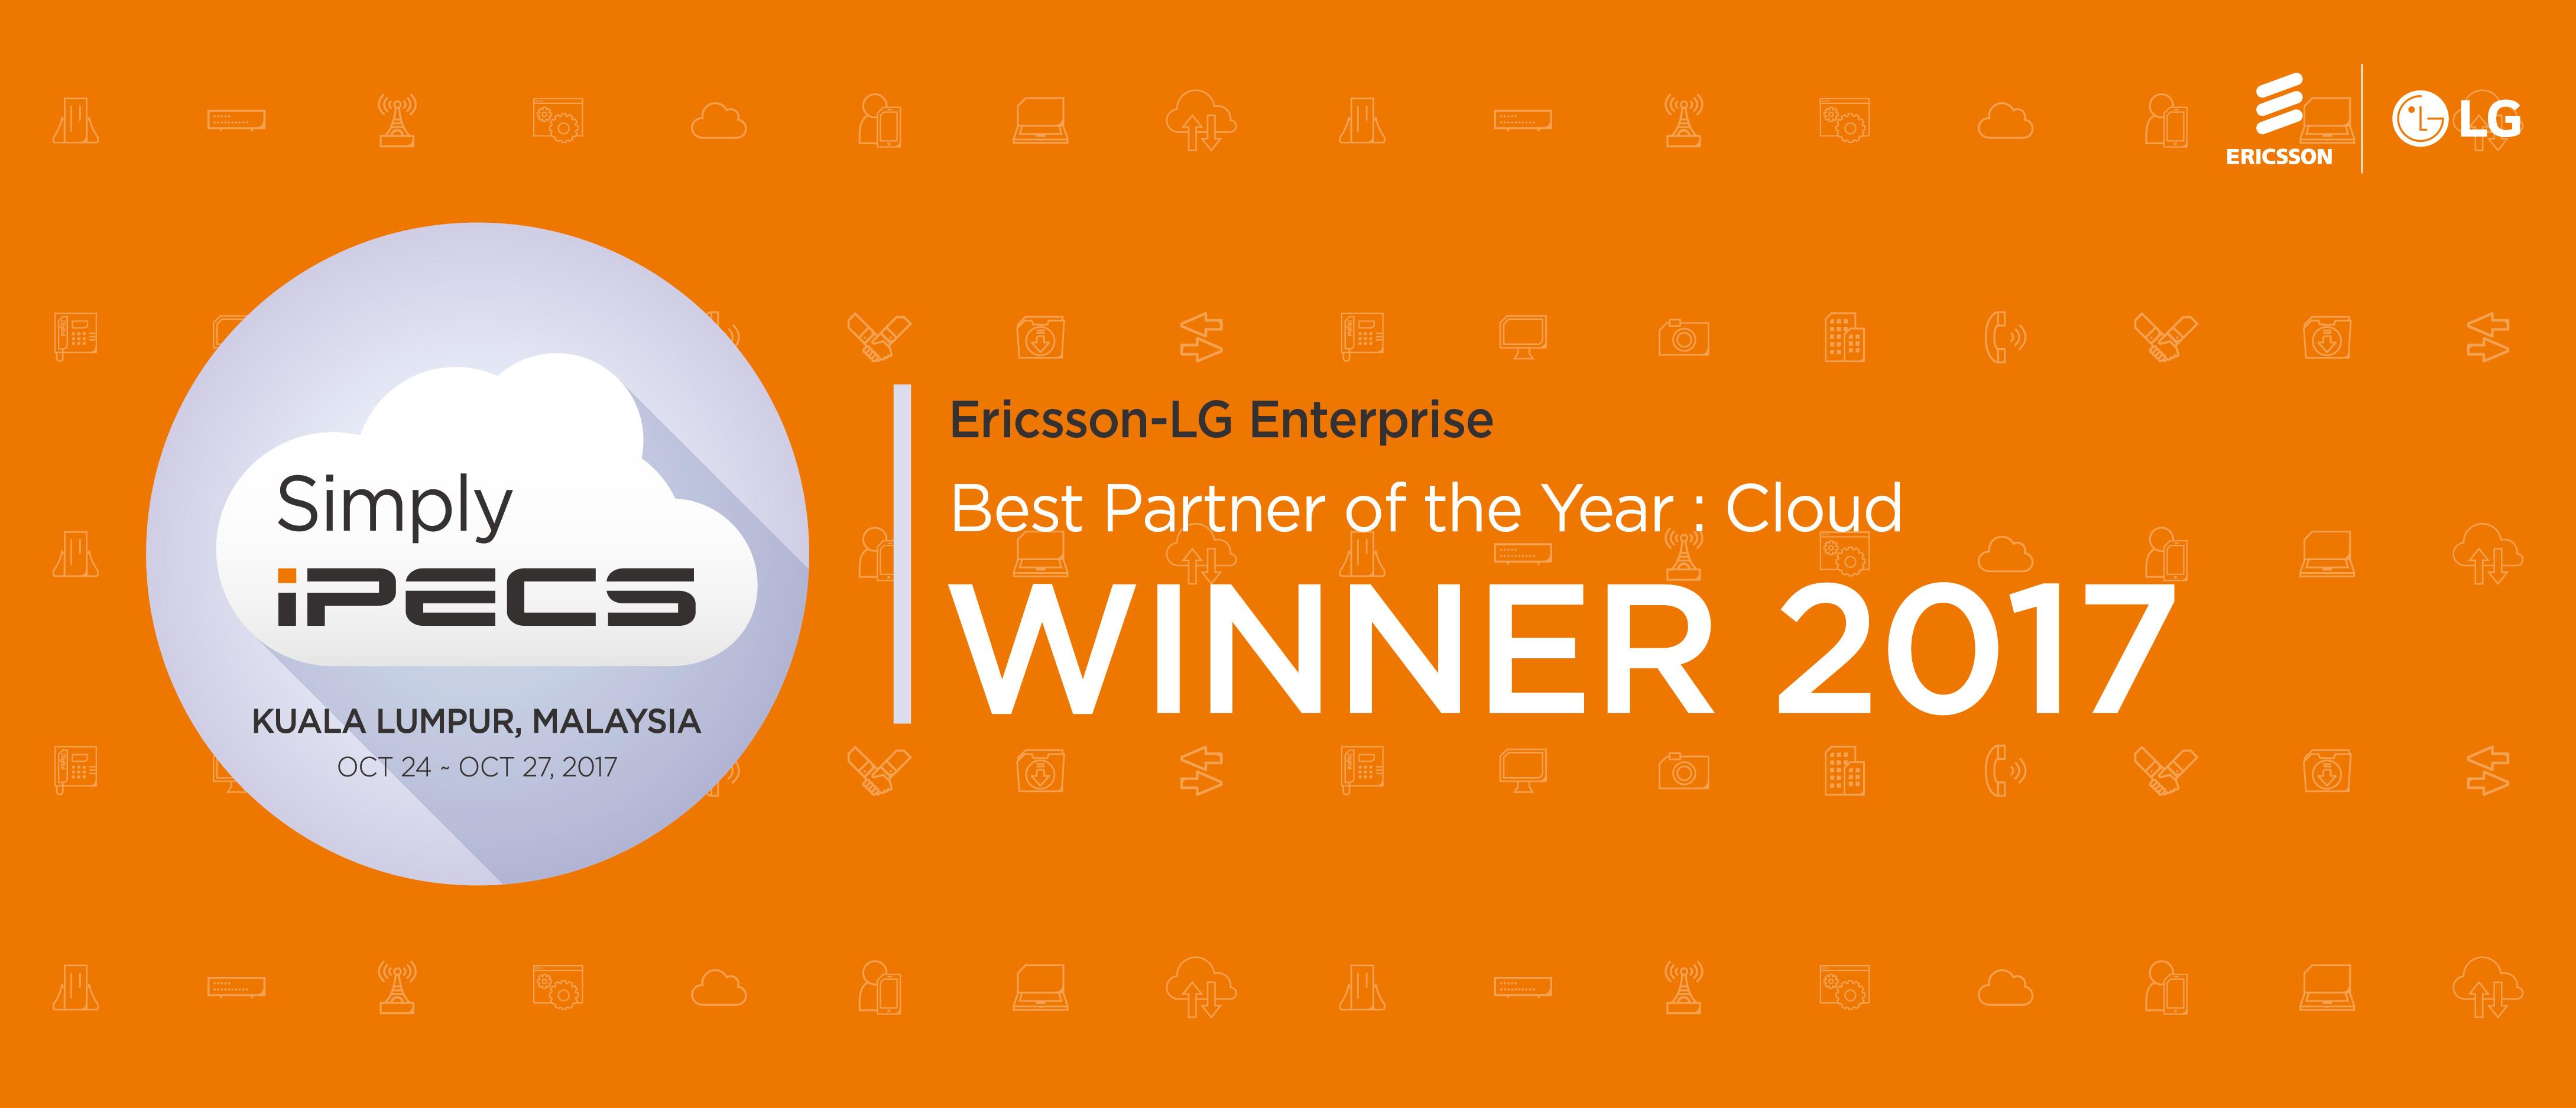 Ericsson-LG Award Pragma